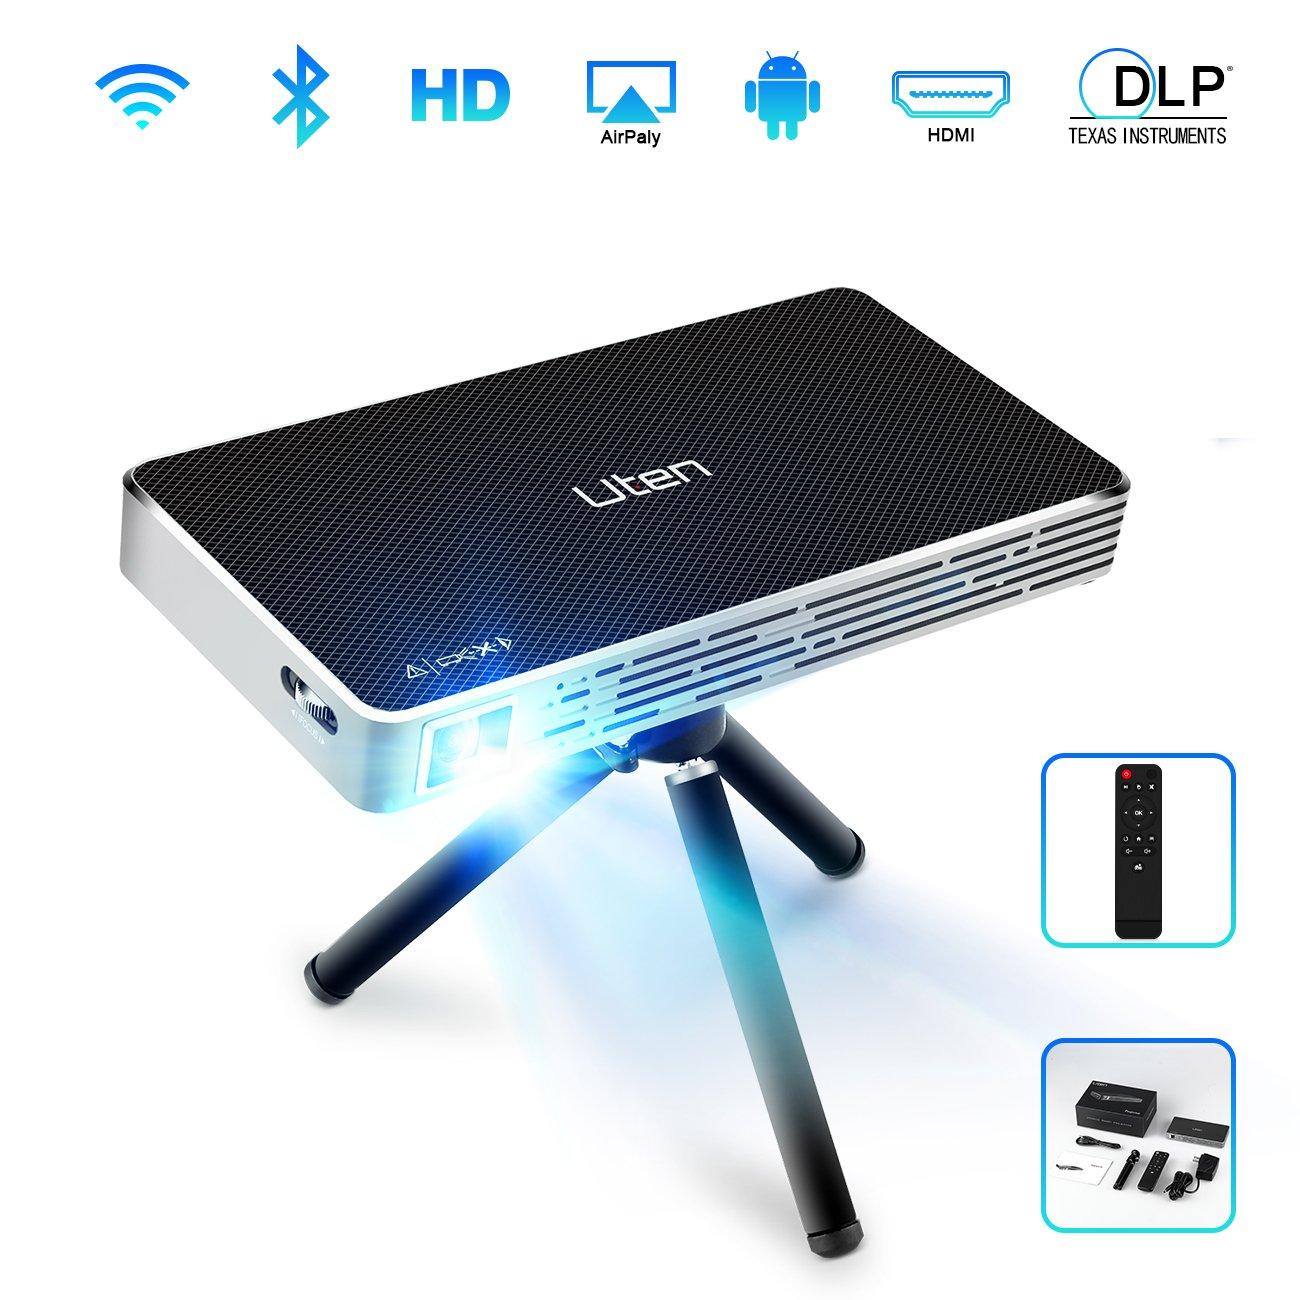 Mini Beamer DLP Projektor, Uten Tragbarer Heimbeamer: Amazon.de ...